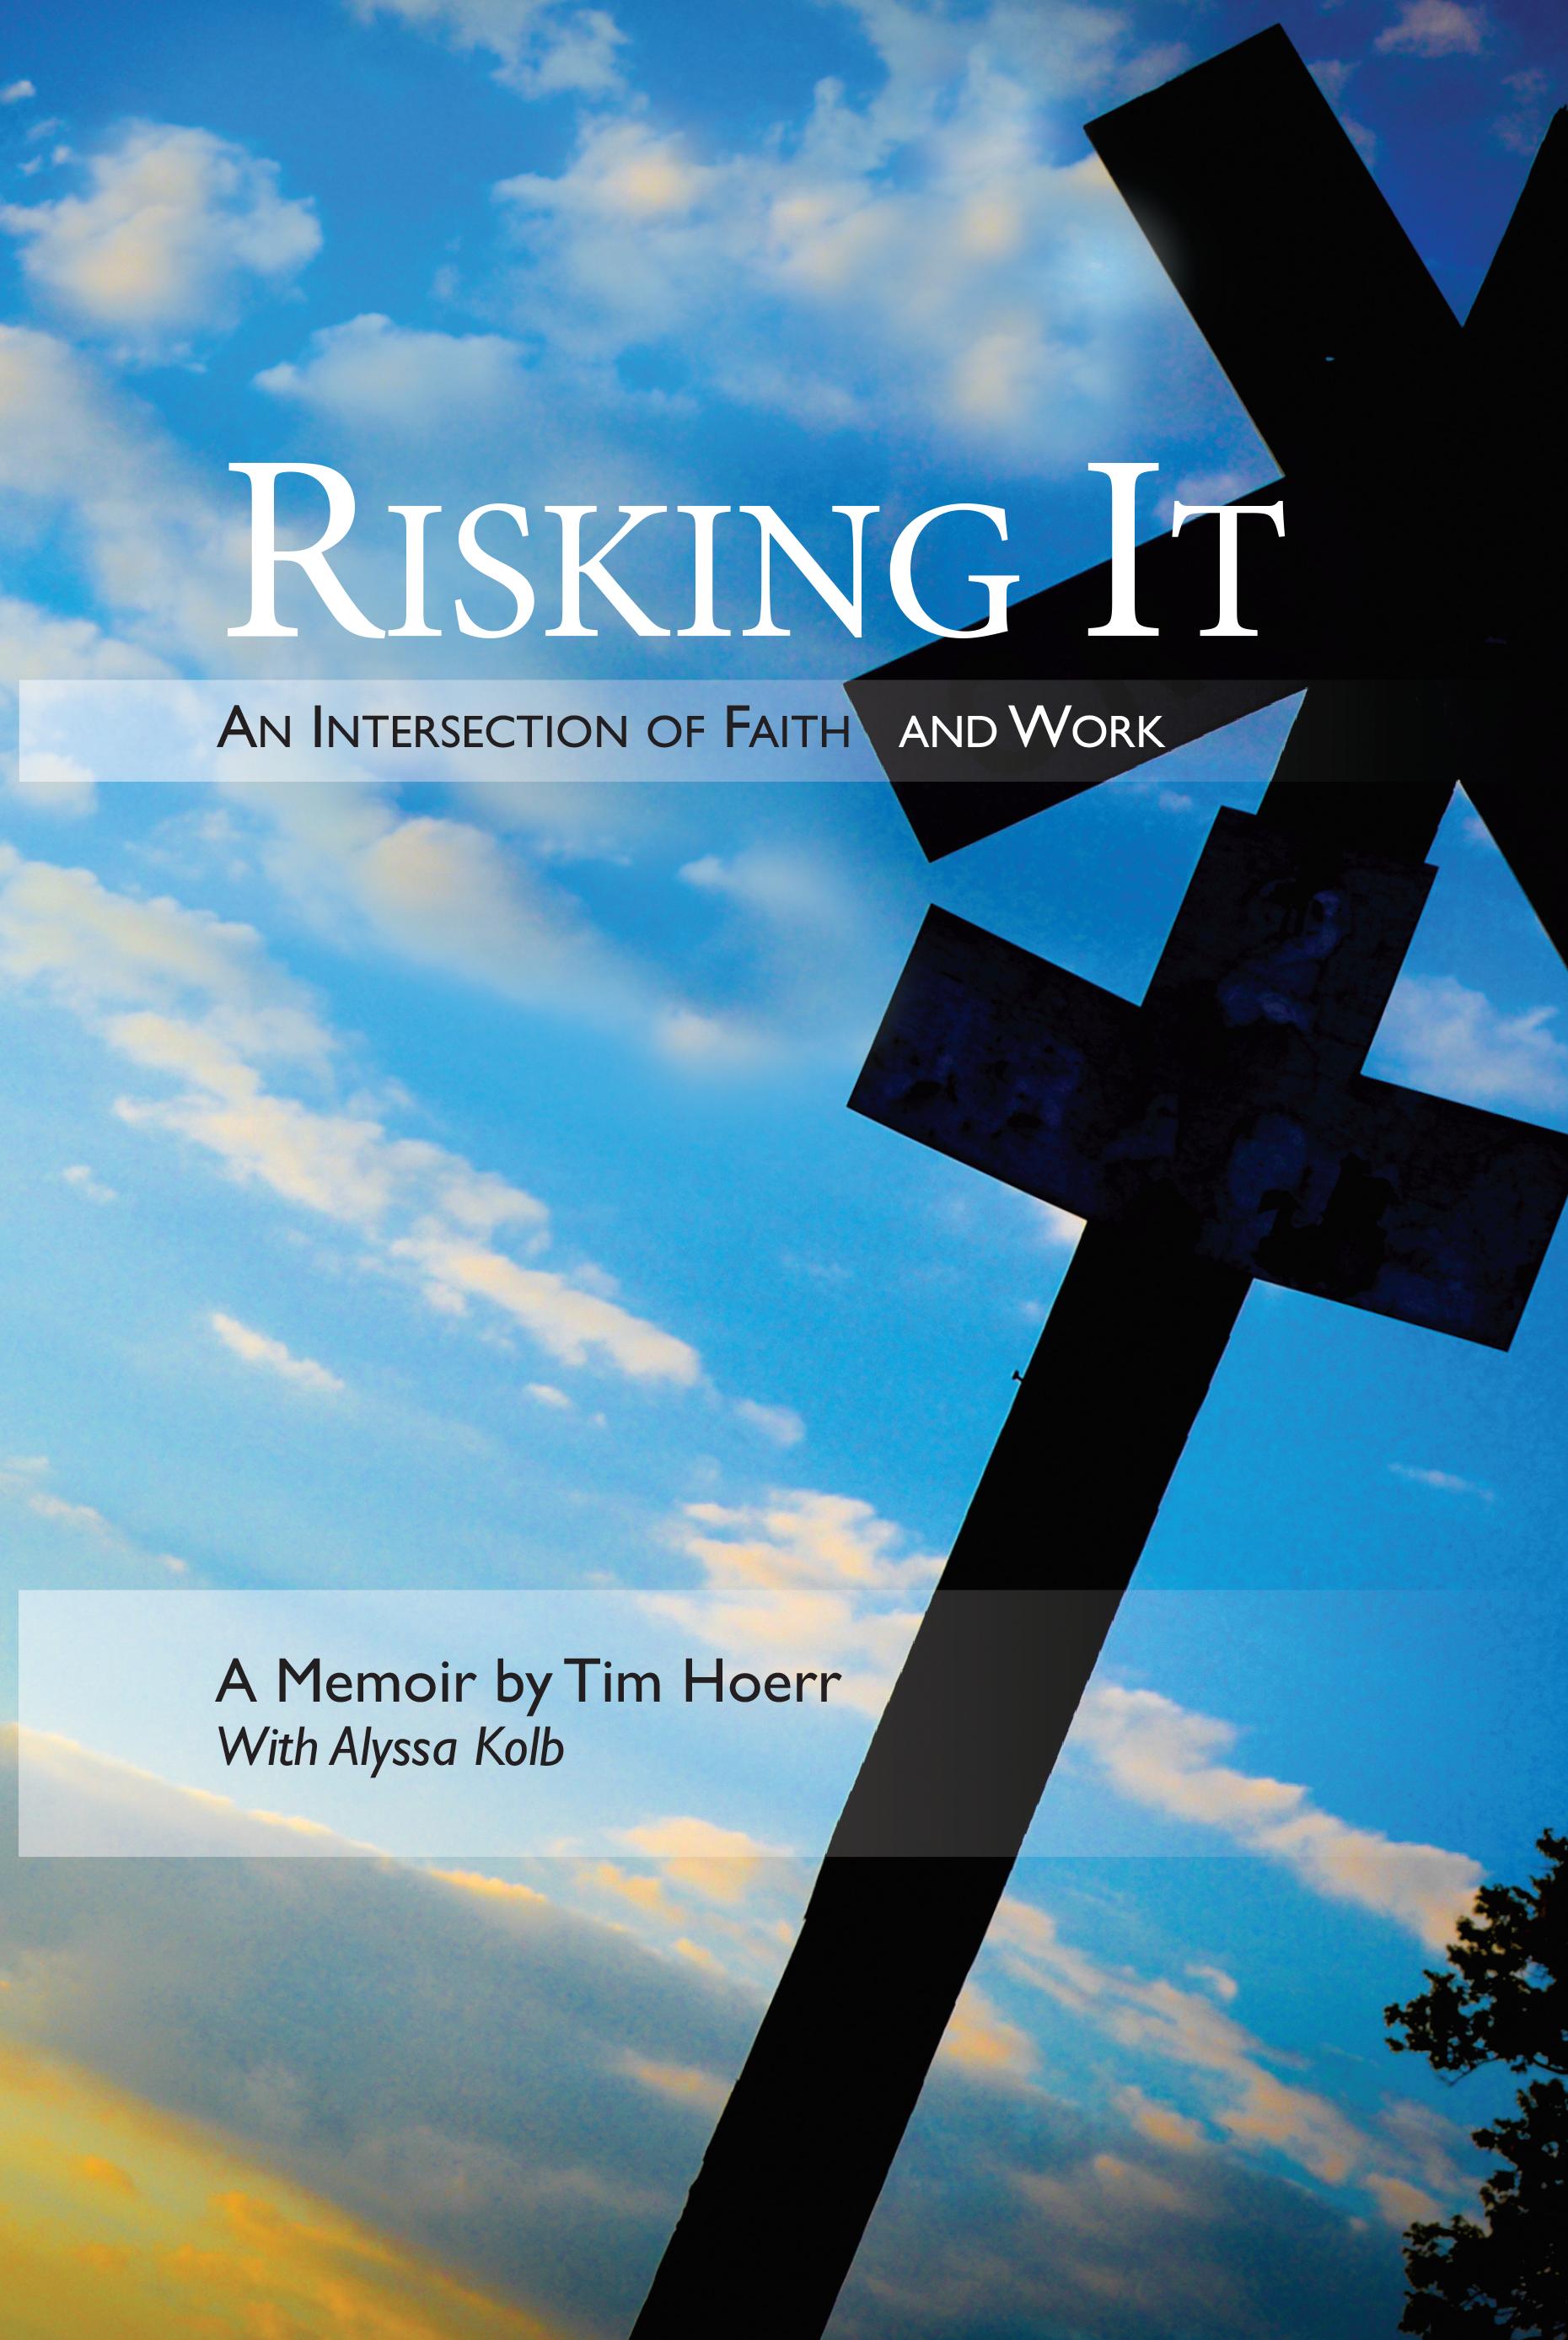 tim-hoerr-risking-it-book-cover